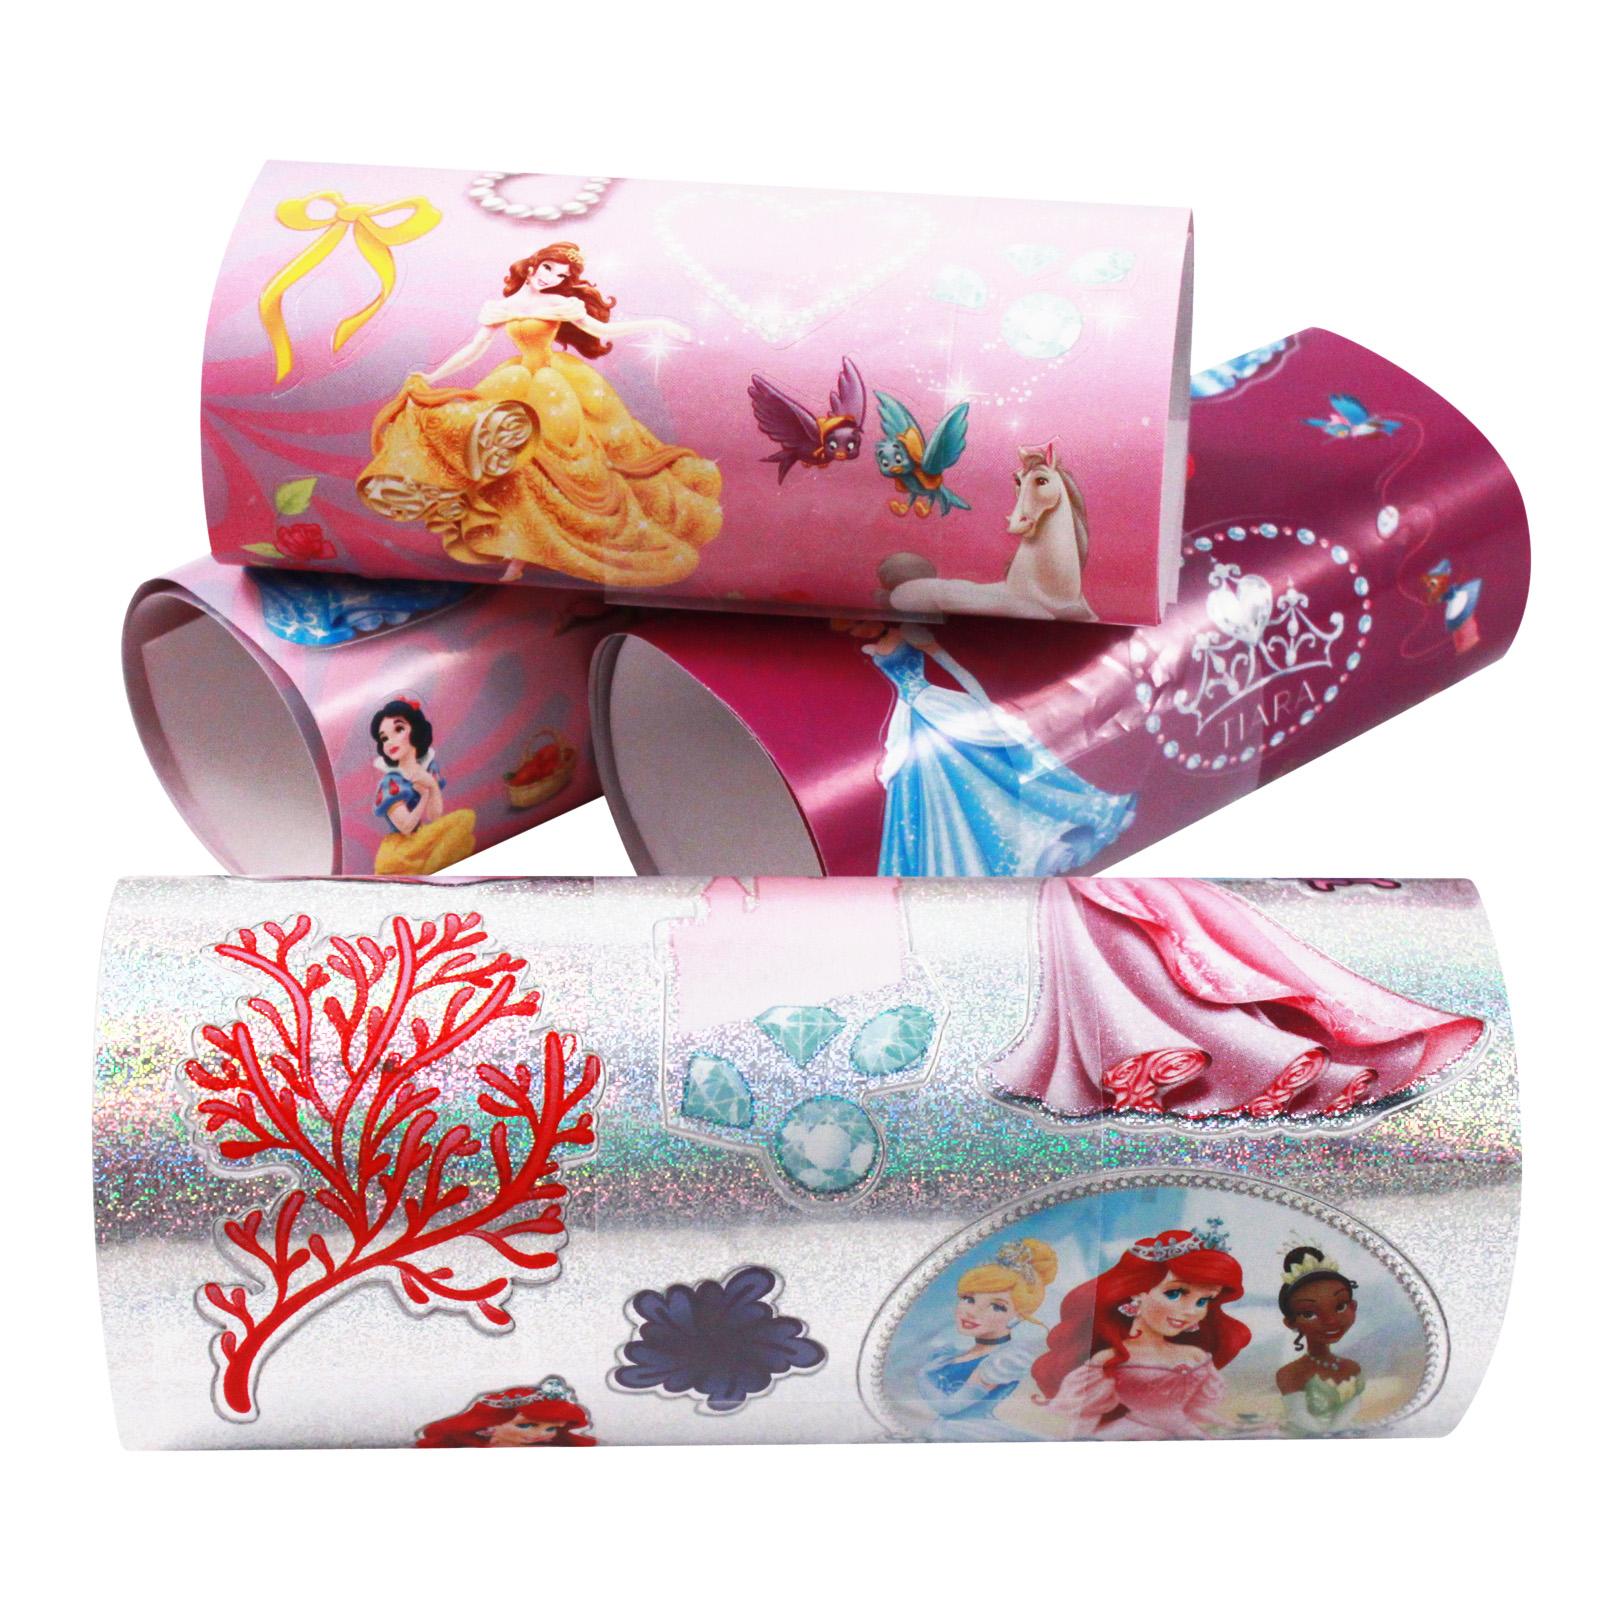 450pc Disney Princess Themed Sticker Mania Girls Art Supplies Crafting Set